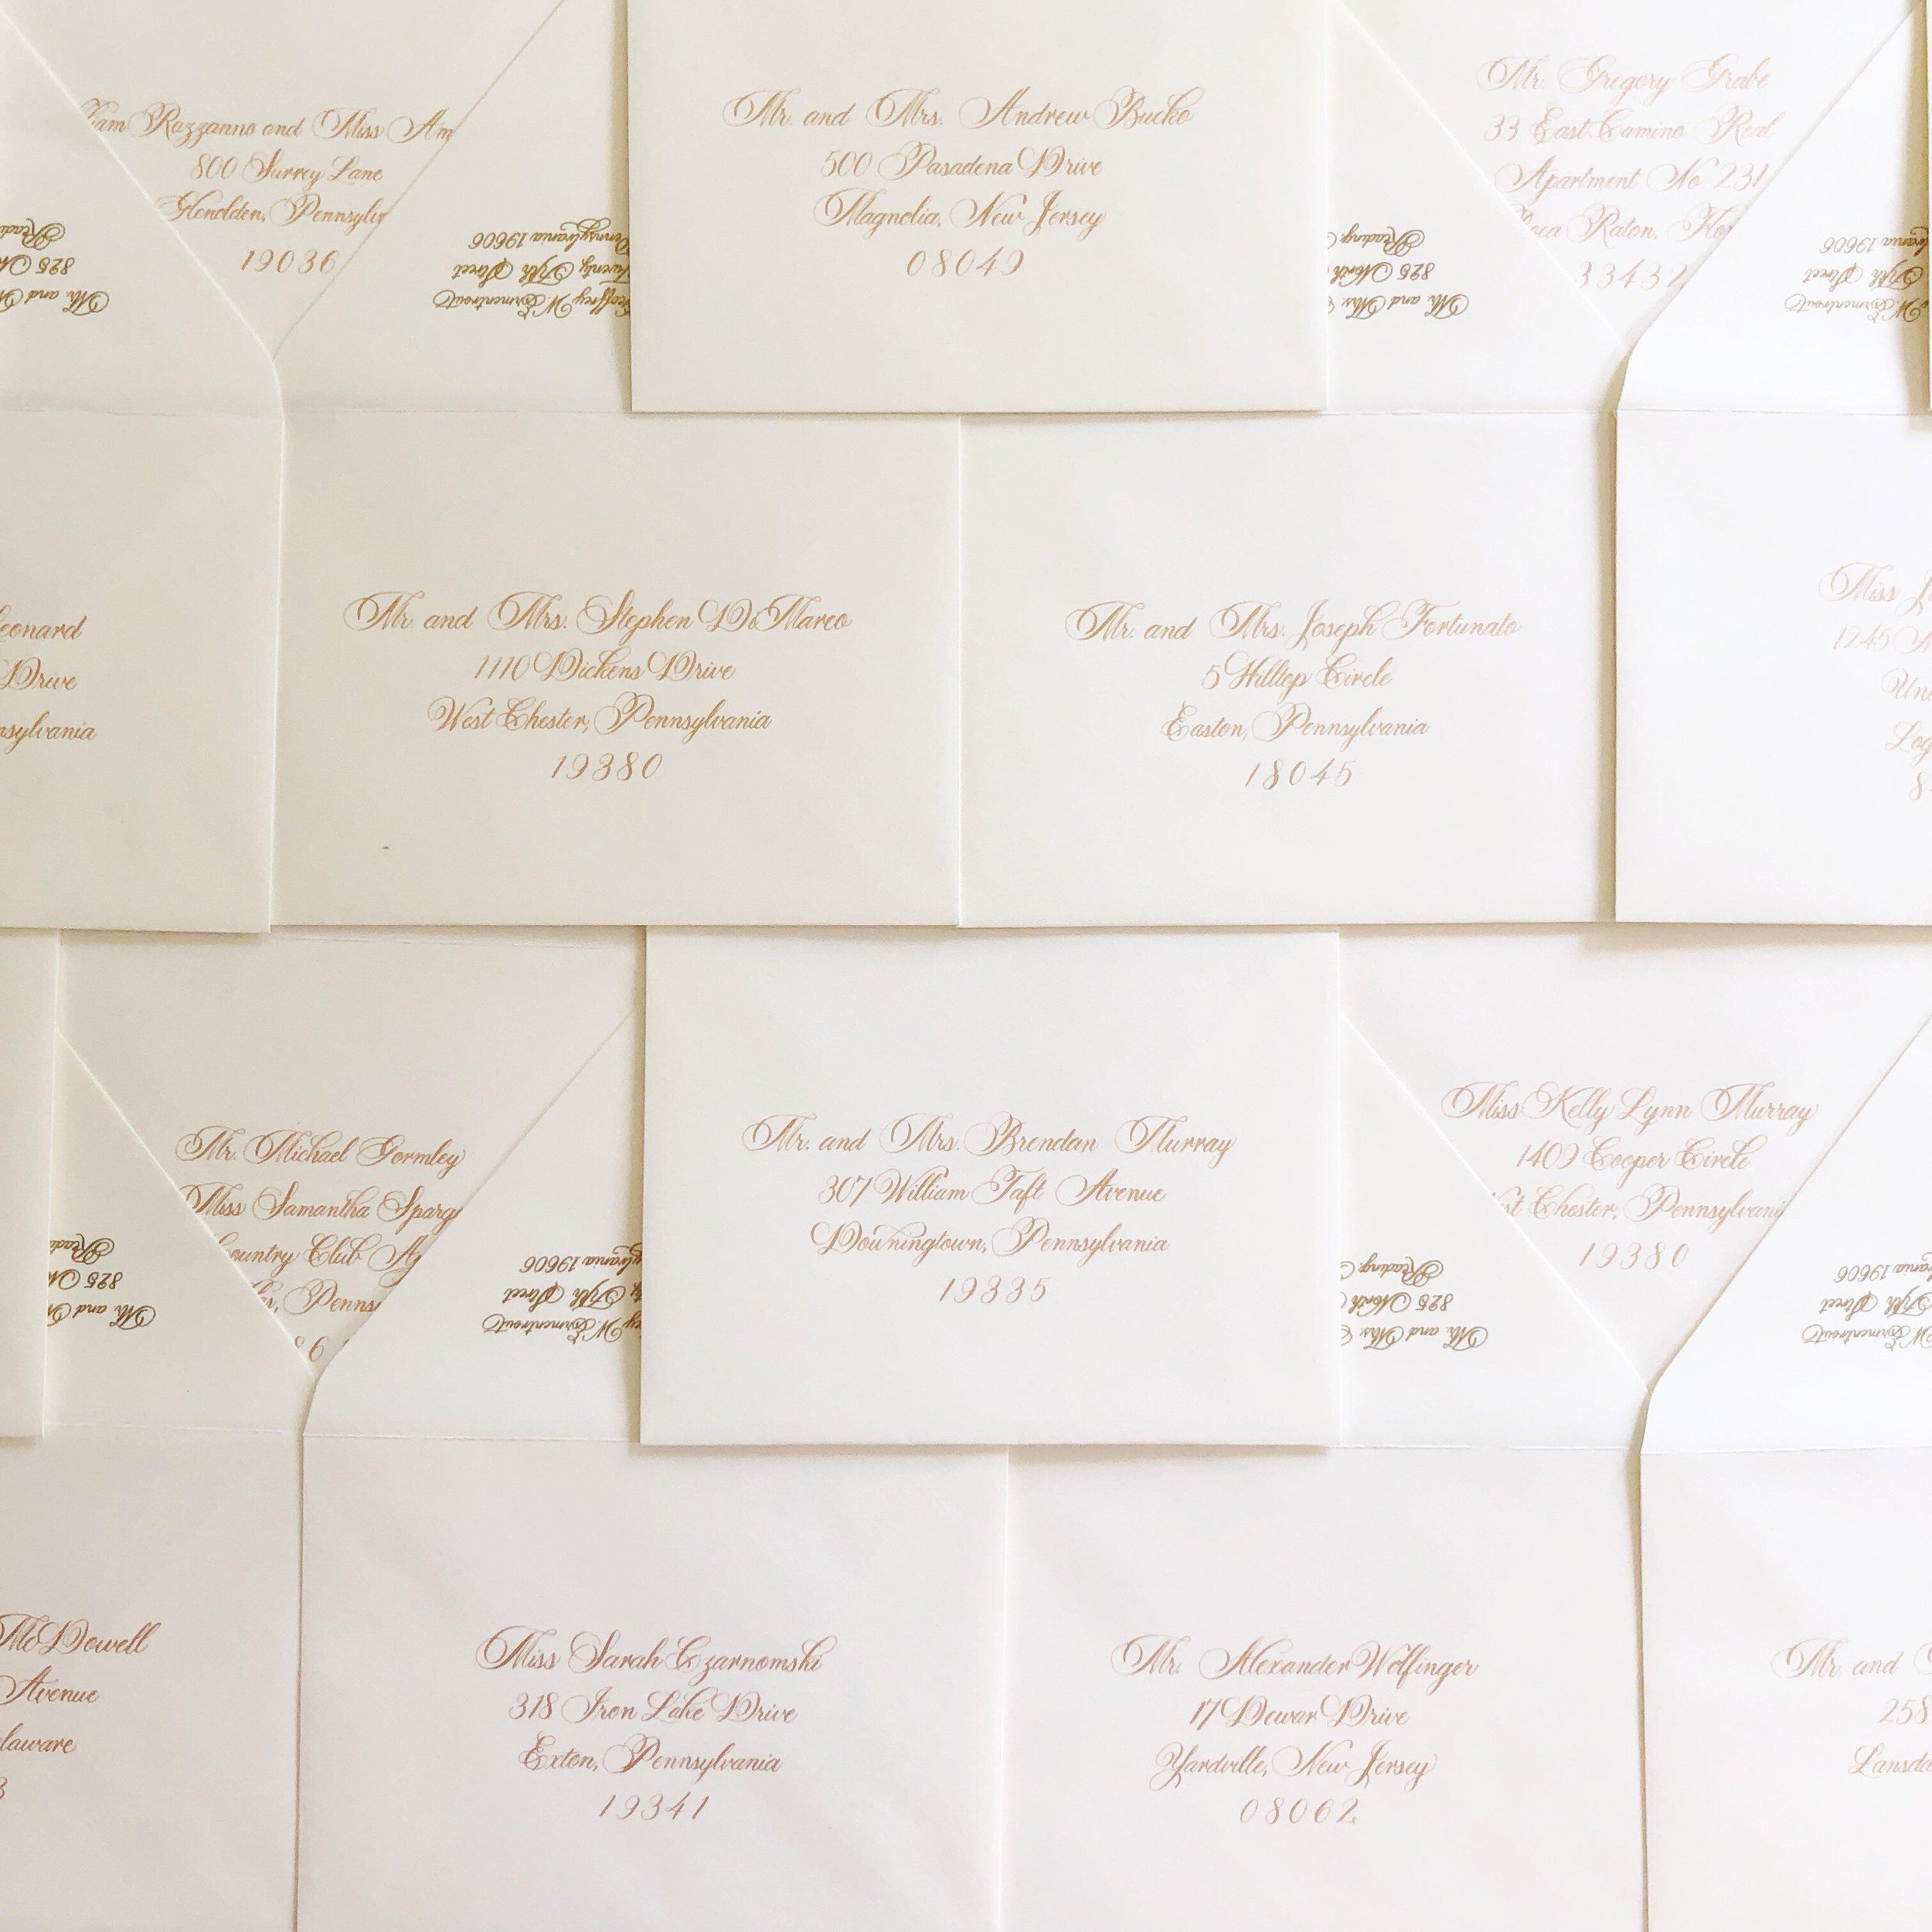 Central PA, York PA, JesSmith Designs, custom, wedding, invitations, bridal, Harrisburg, hanover, calligraphy, baltimore, wedding invitations, lancaster, gettysburg, 07-06 20.05.03.jpg